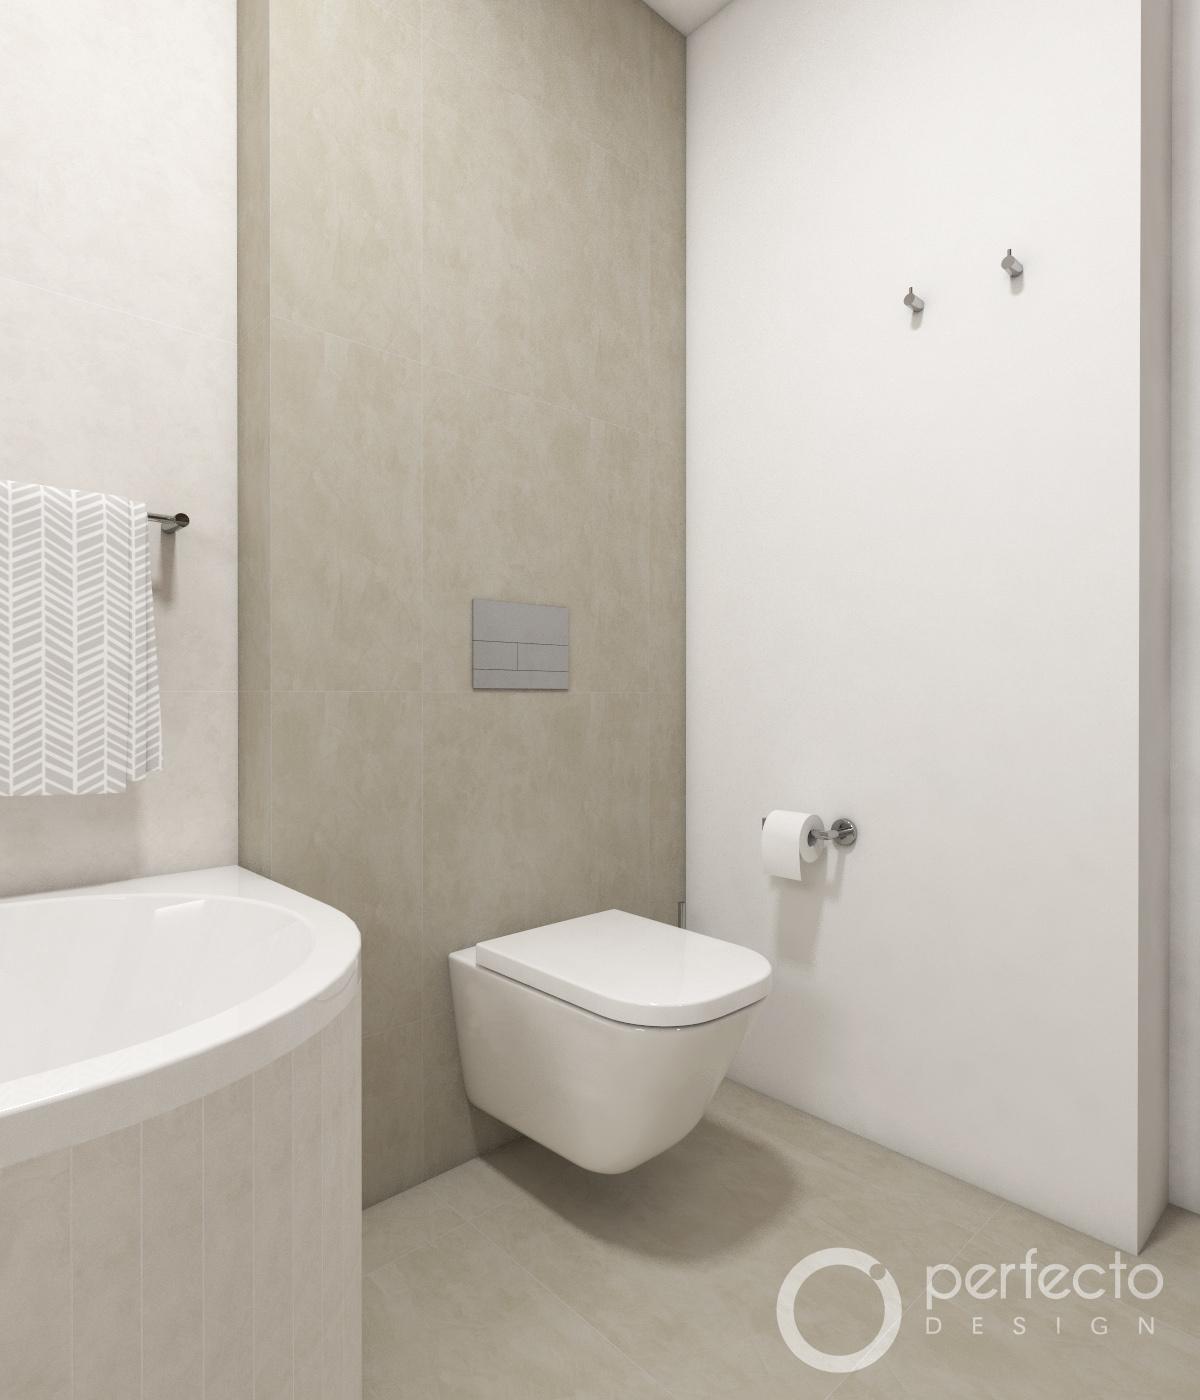 modernes badezimmer lagos perfecto design. Black Bedroom Furniture Sets. Home Design Ideas